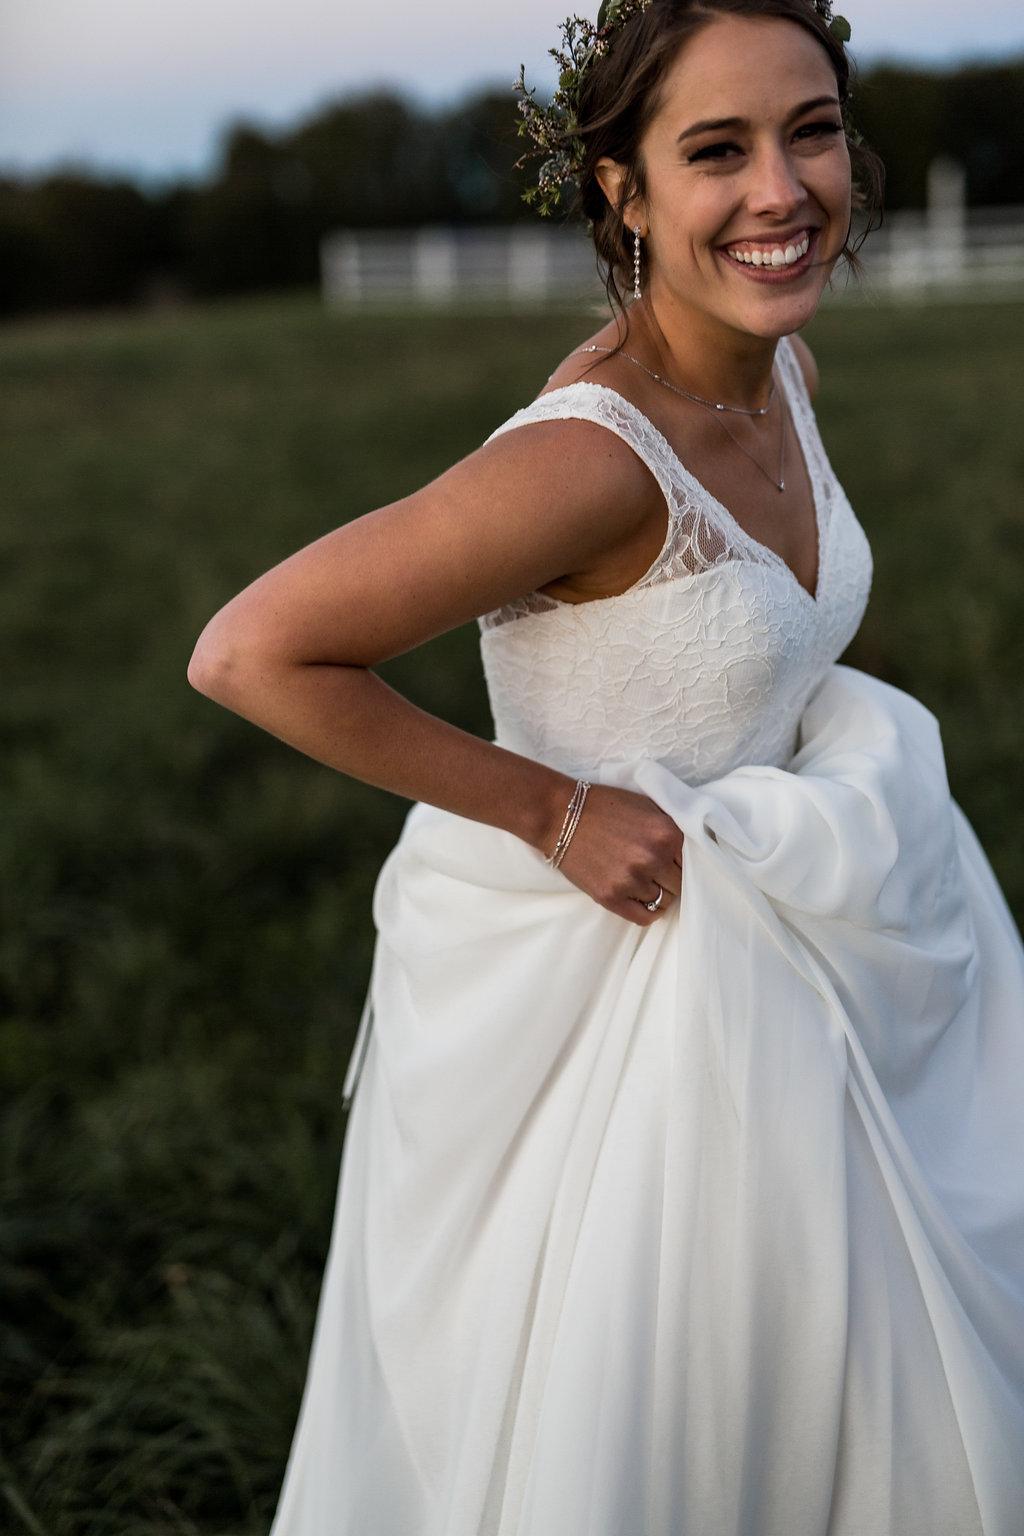 Sonshine_barn_northern_michigan_wedding_-107.jpg